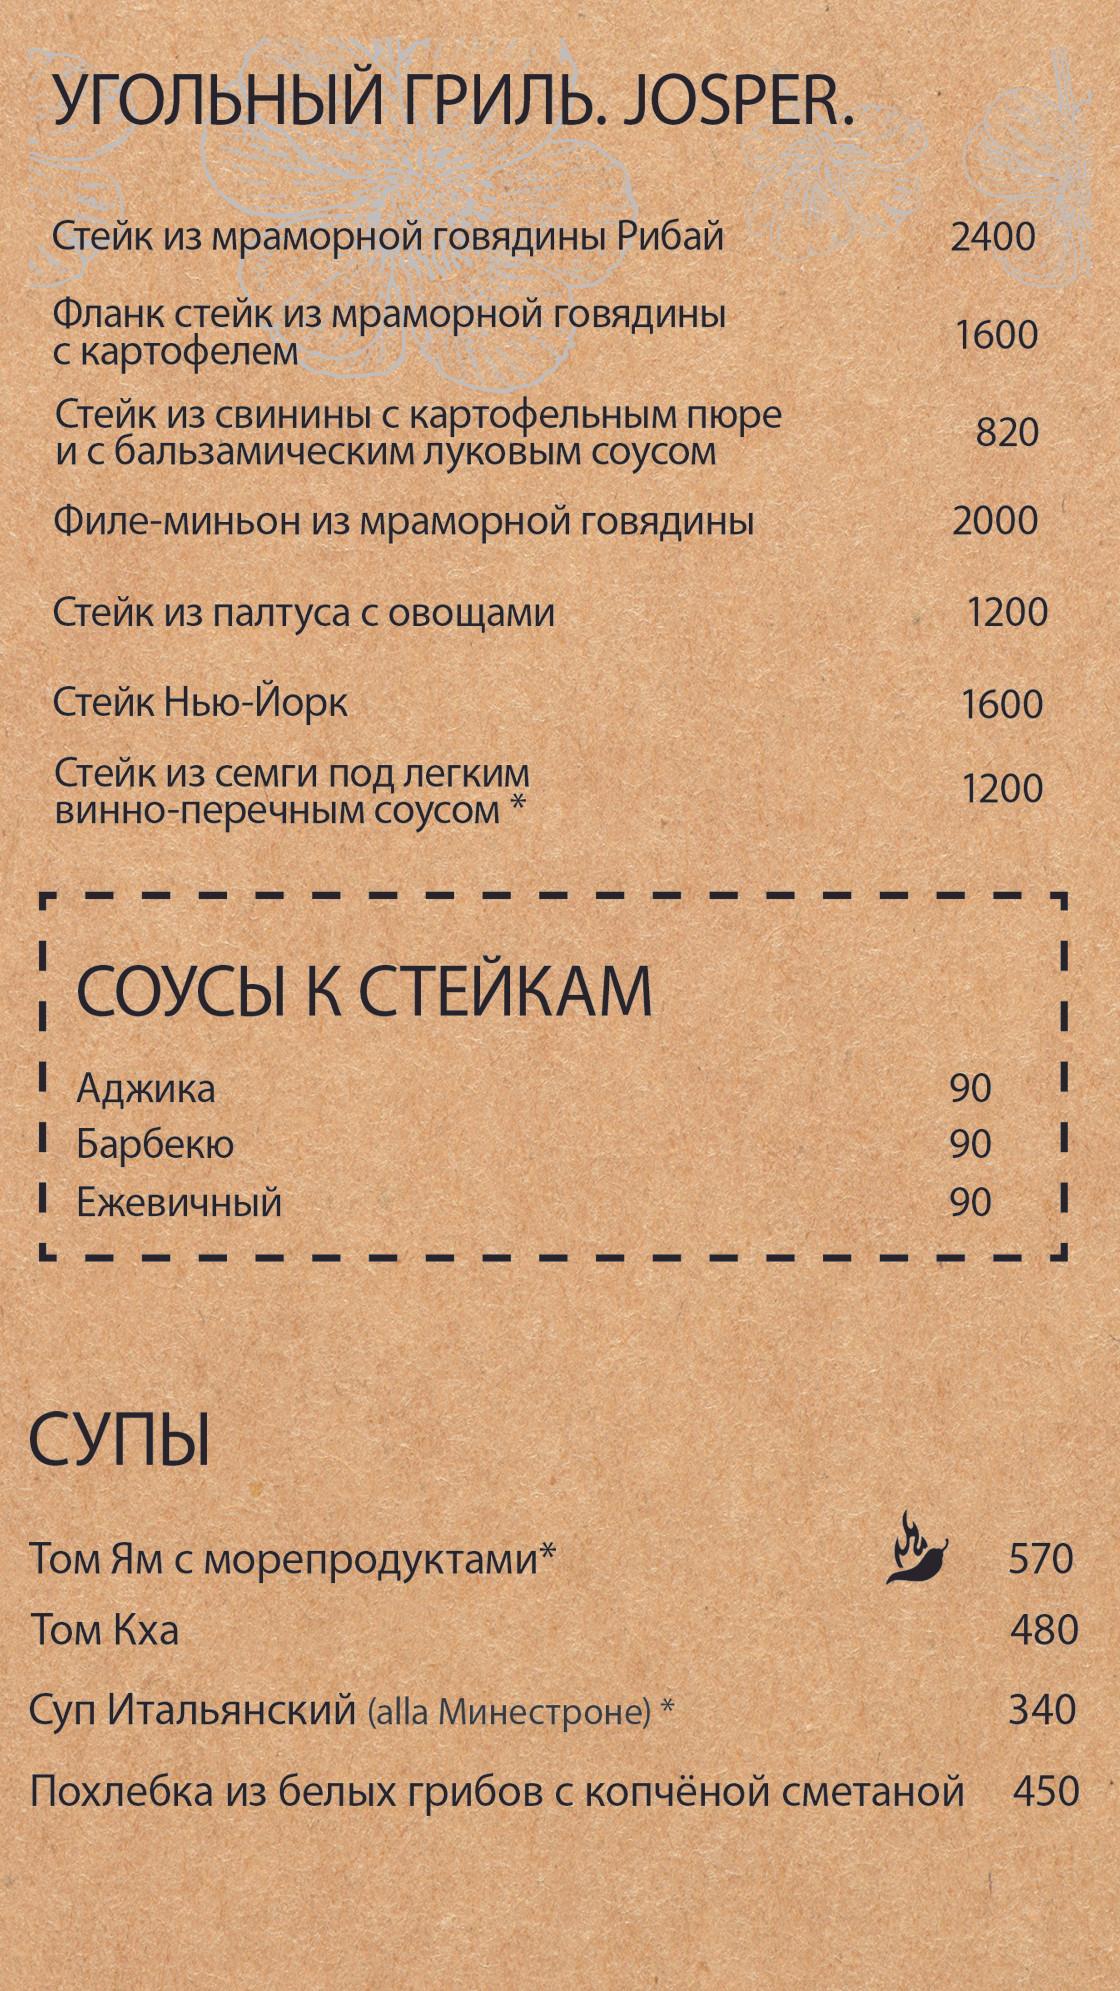 ГРИЛЬ СОУСЫ СУПЫ.jpg